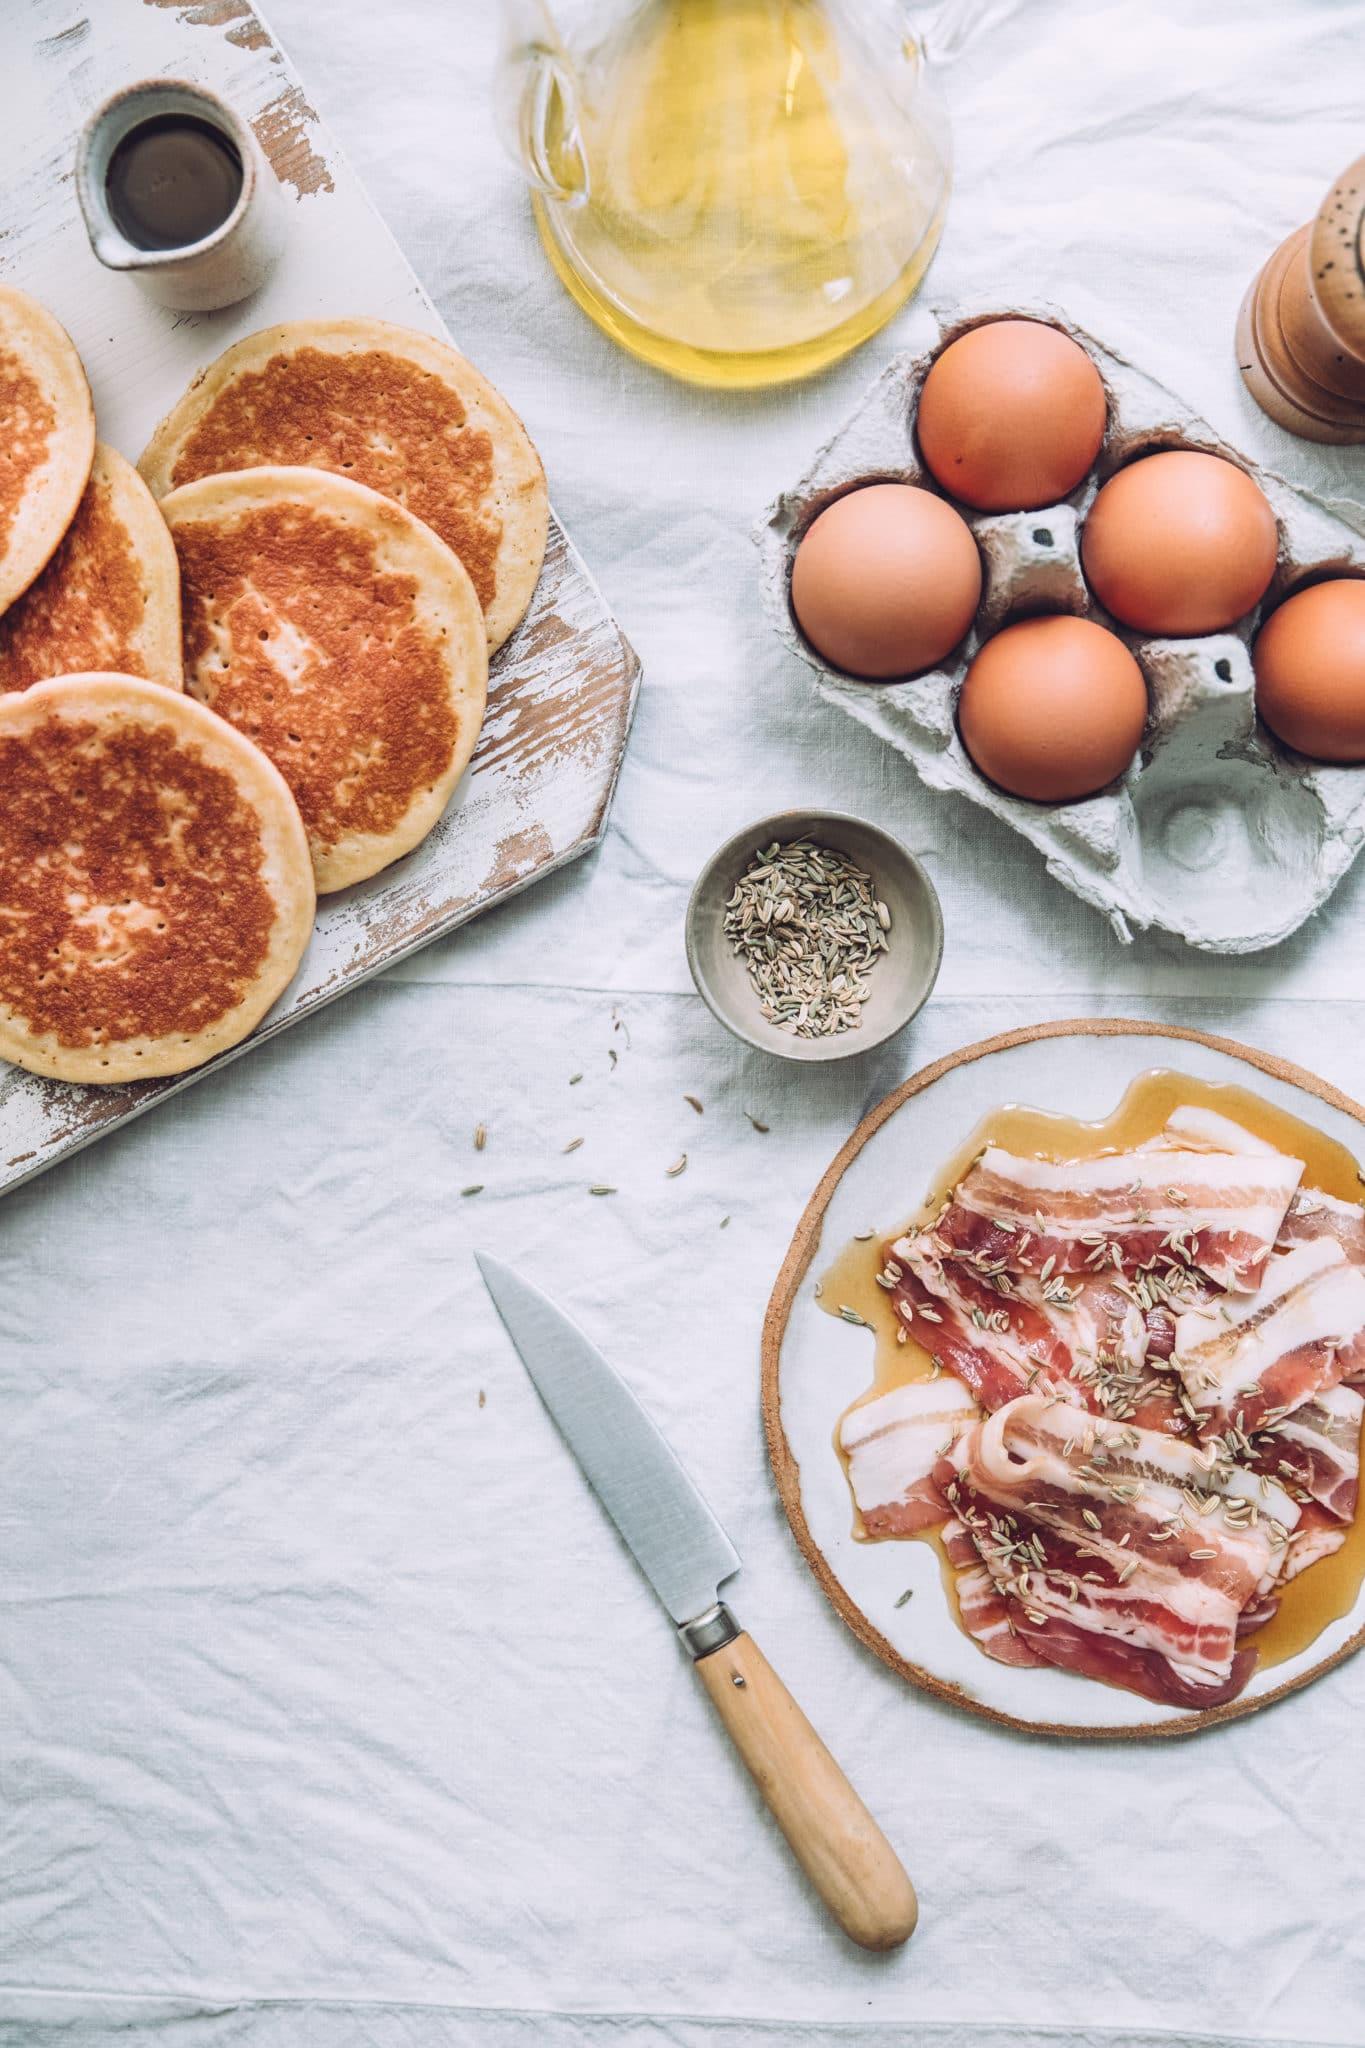 Pancakes Mégane Ardérighi Megandcook styliste culinaire lyon